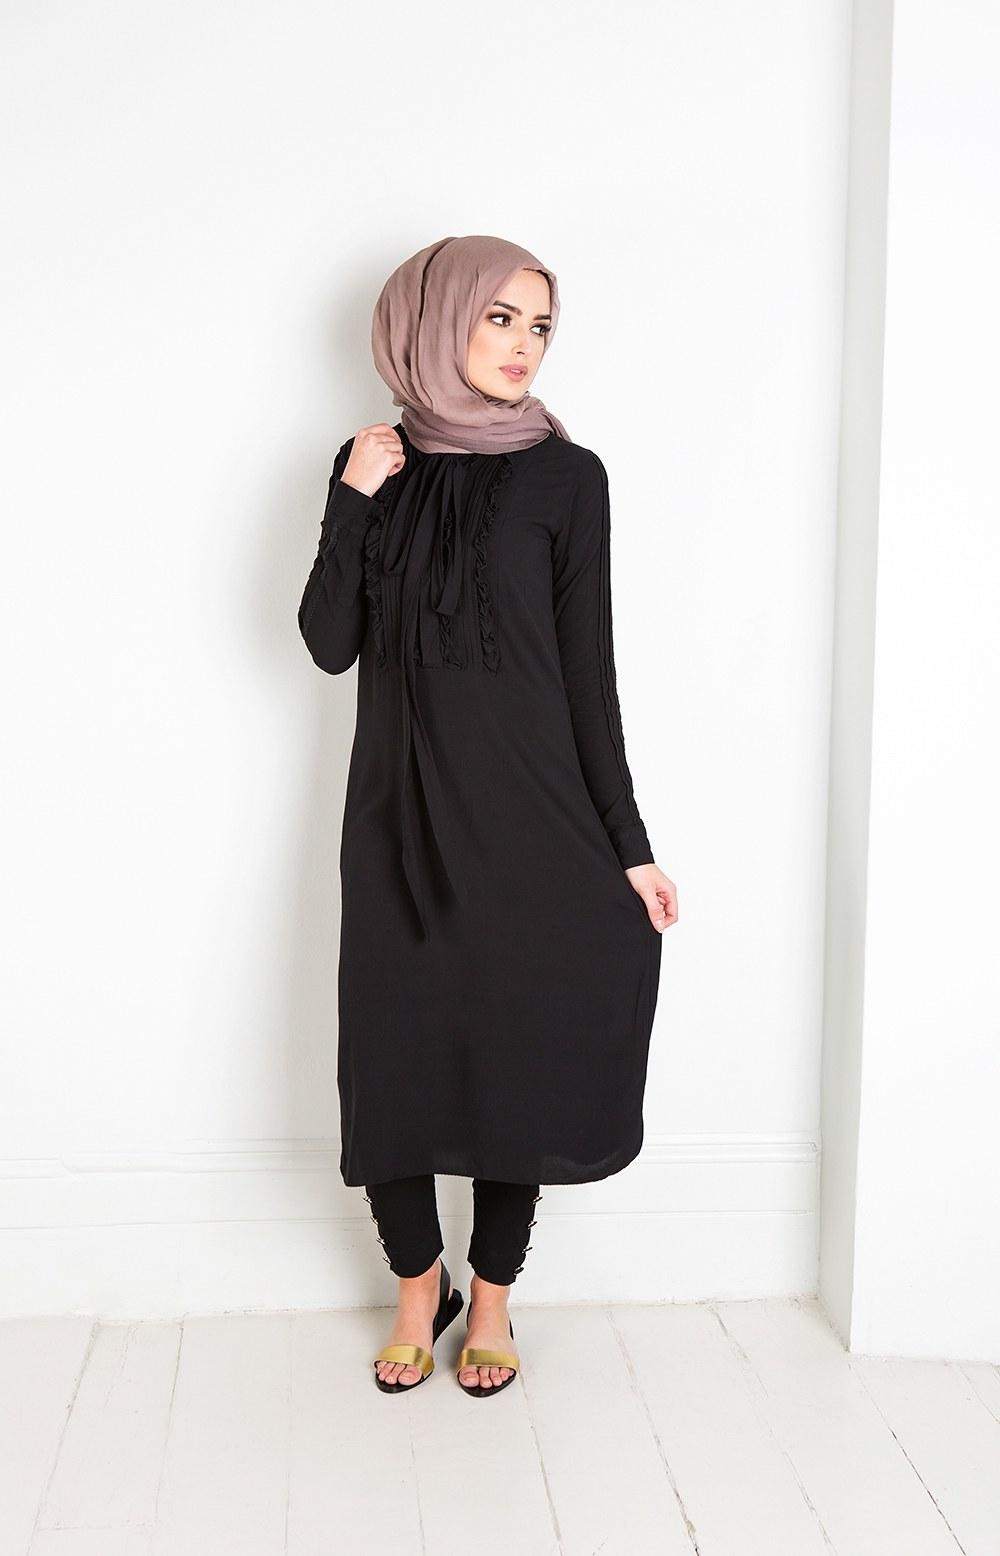 Design Model Baju Lebaran Simple Ffdn 25 Trend Model Baju Muslim Lebaran 2018 Simple & Modis